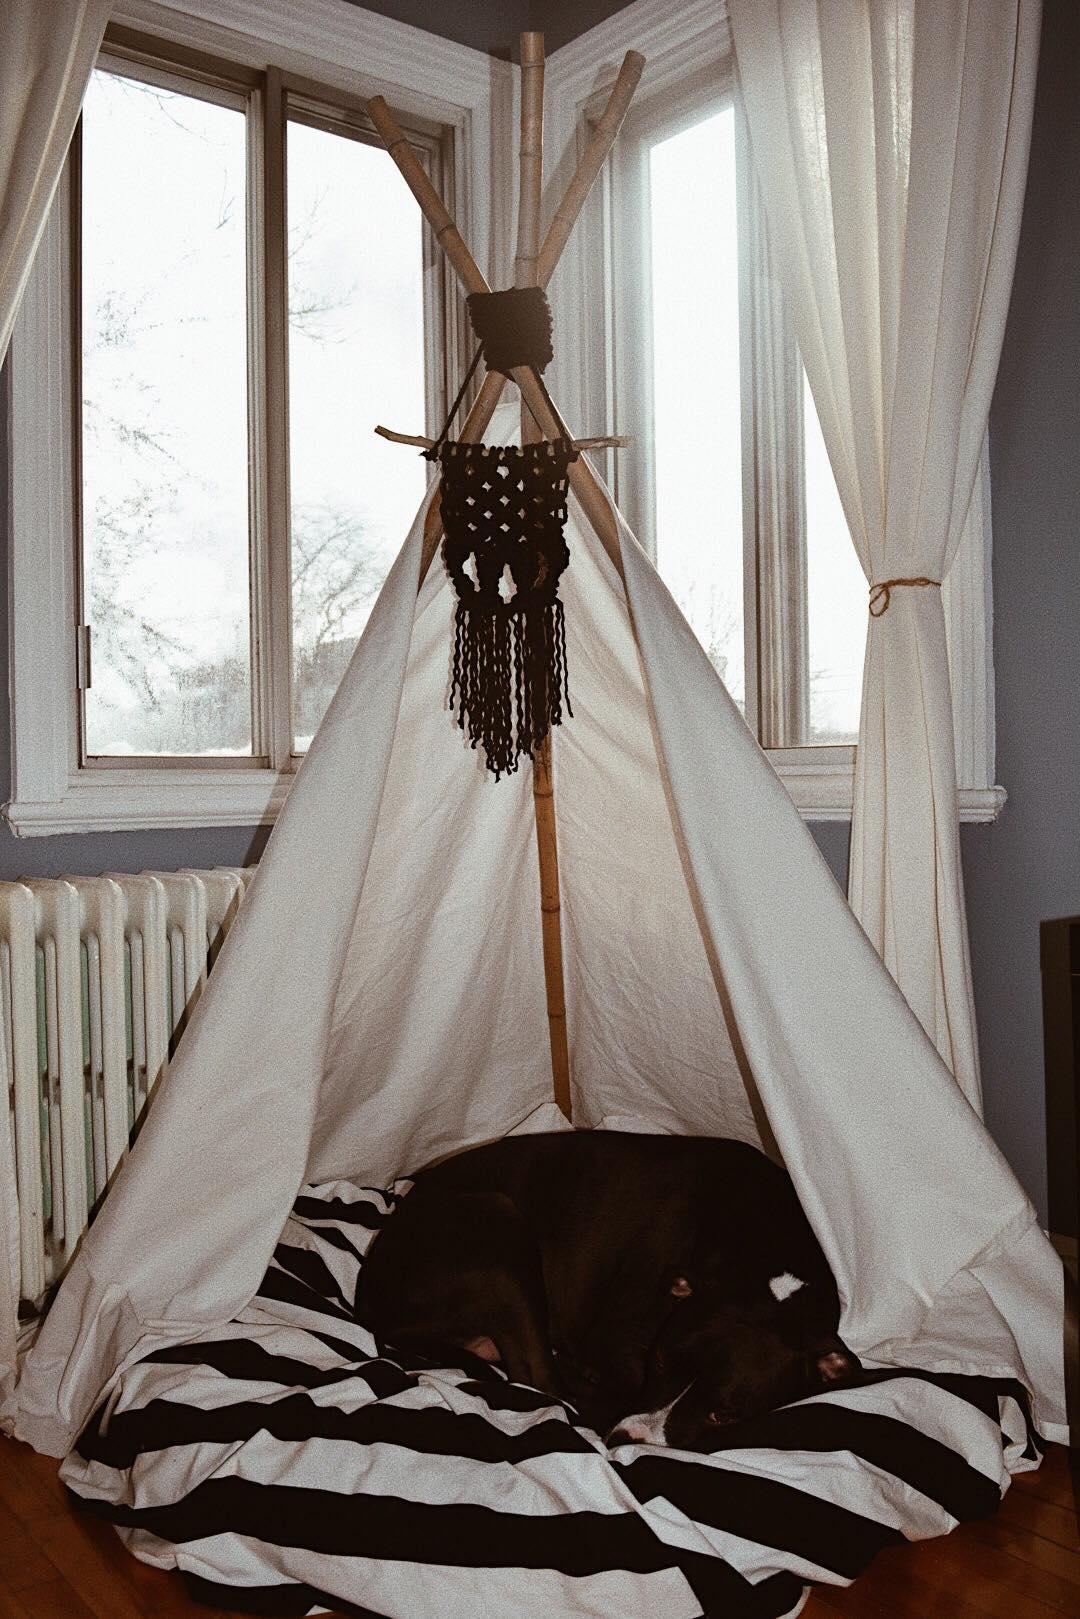 diy tipi pour chiens chats. Black Bedroom Furniture Sets. Home Design Ideas